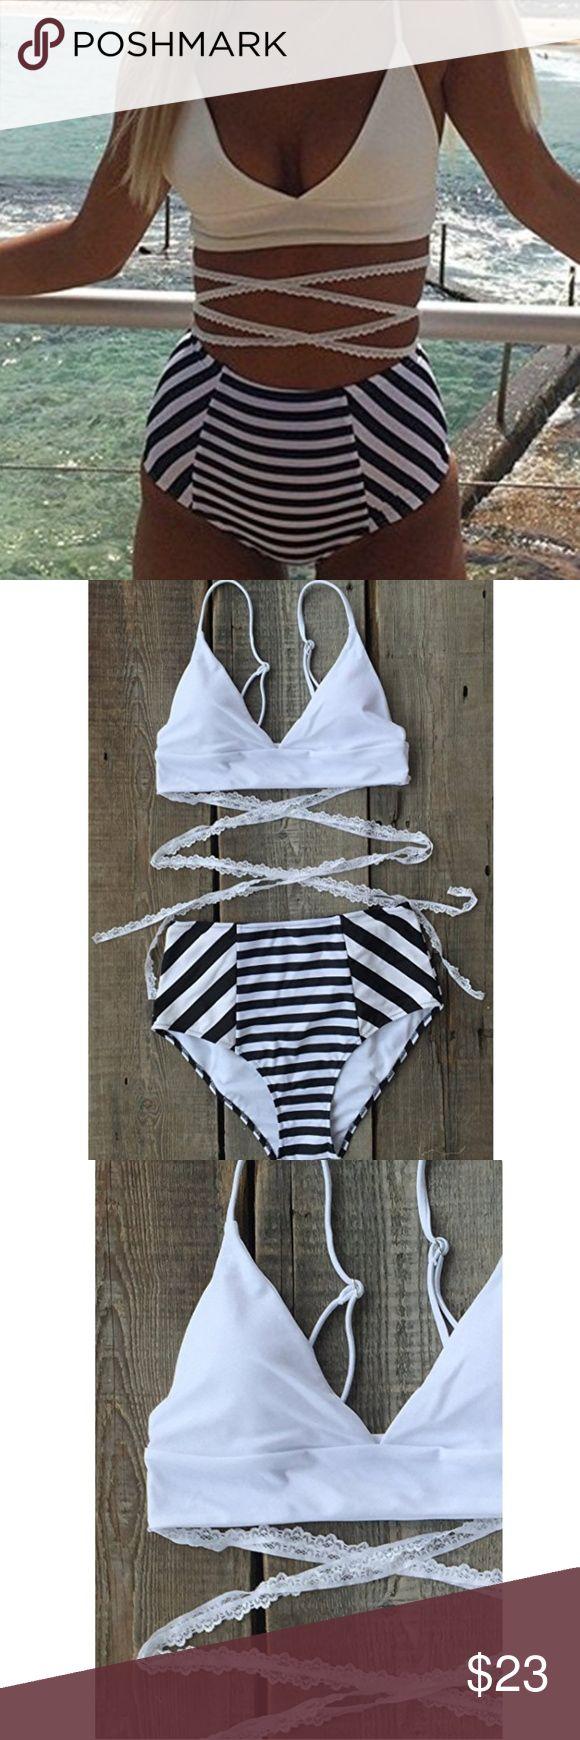 2 piece Bikini White top with Lace ties, black and white striped high waisted bottoms Swim Bikinis